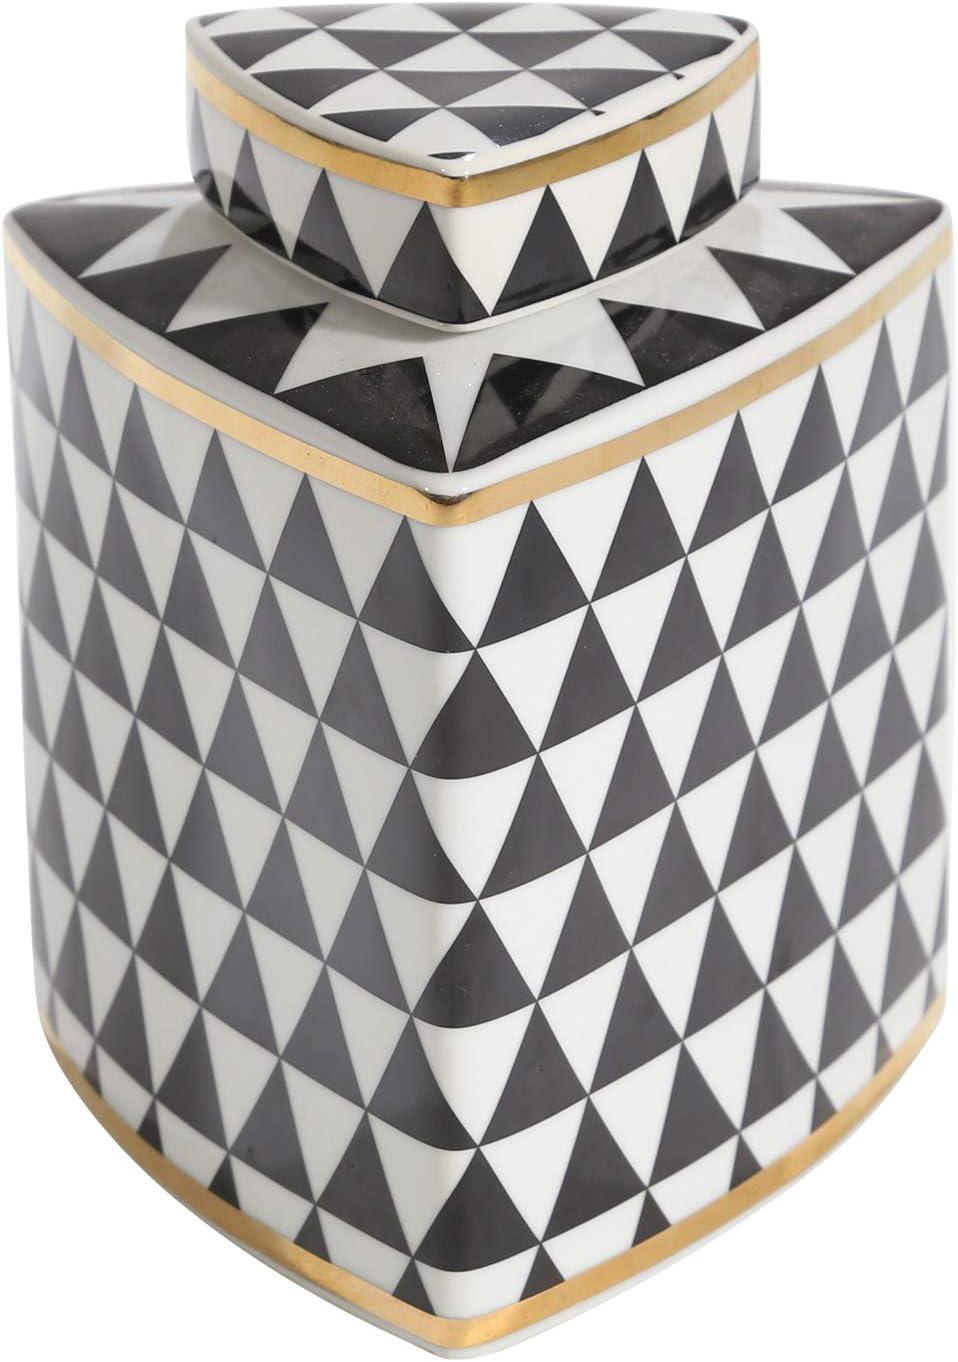 Sagebrook Home Ceramic Triangular Covered JAR, Black/White/Gold, 6.25x6.25x15,